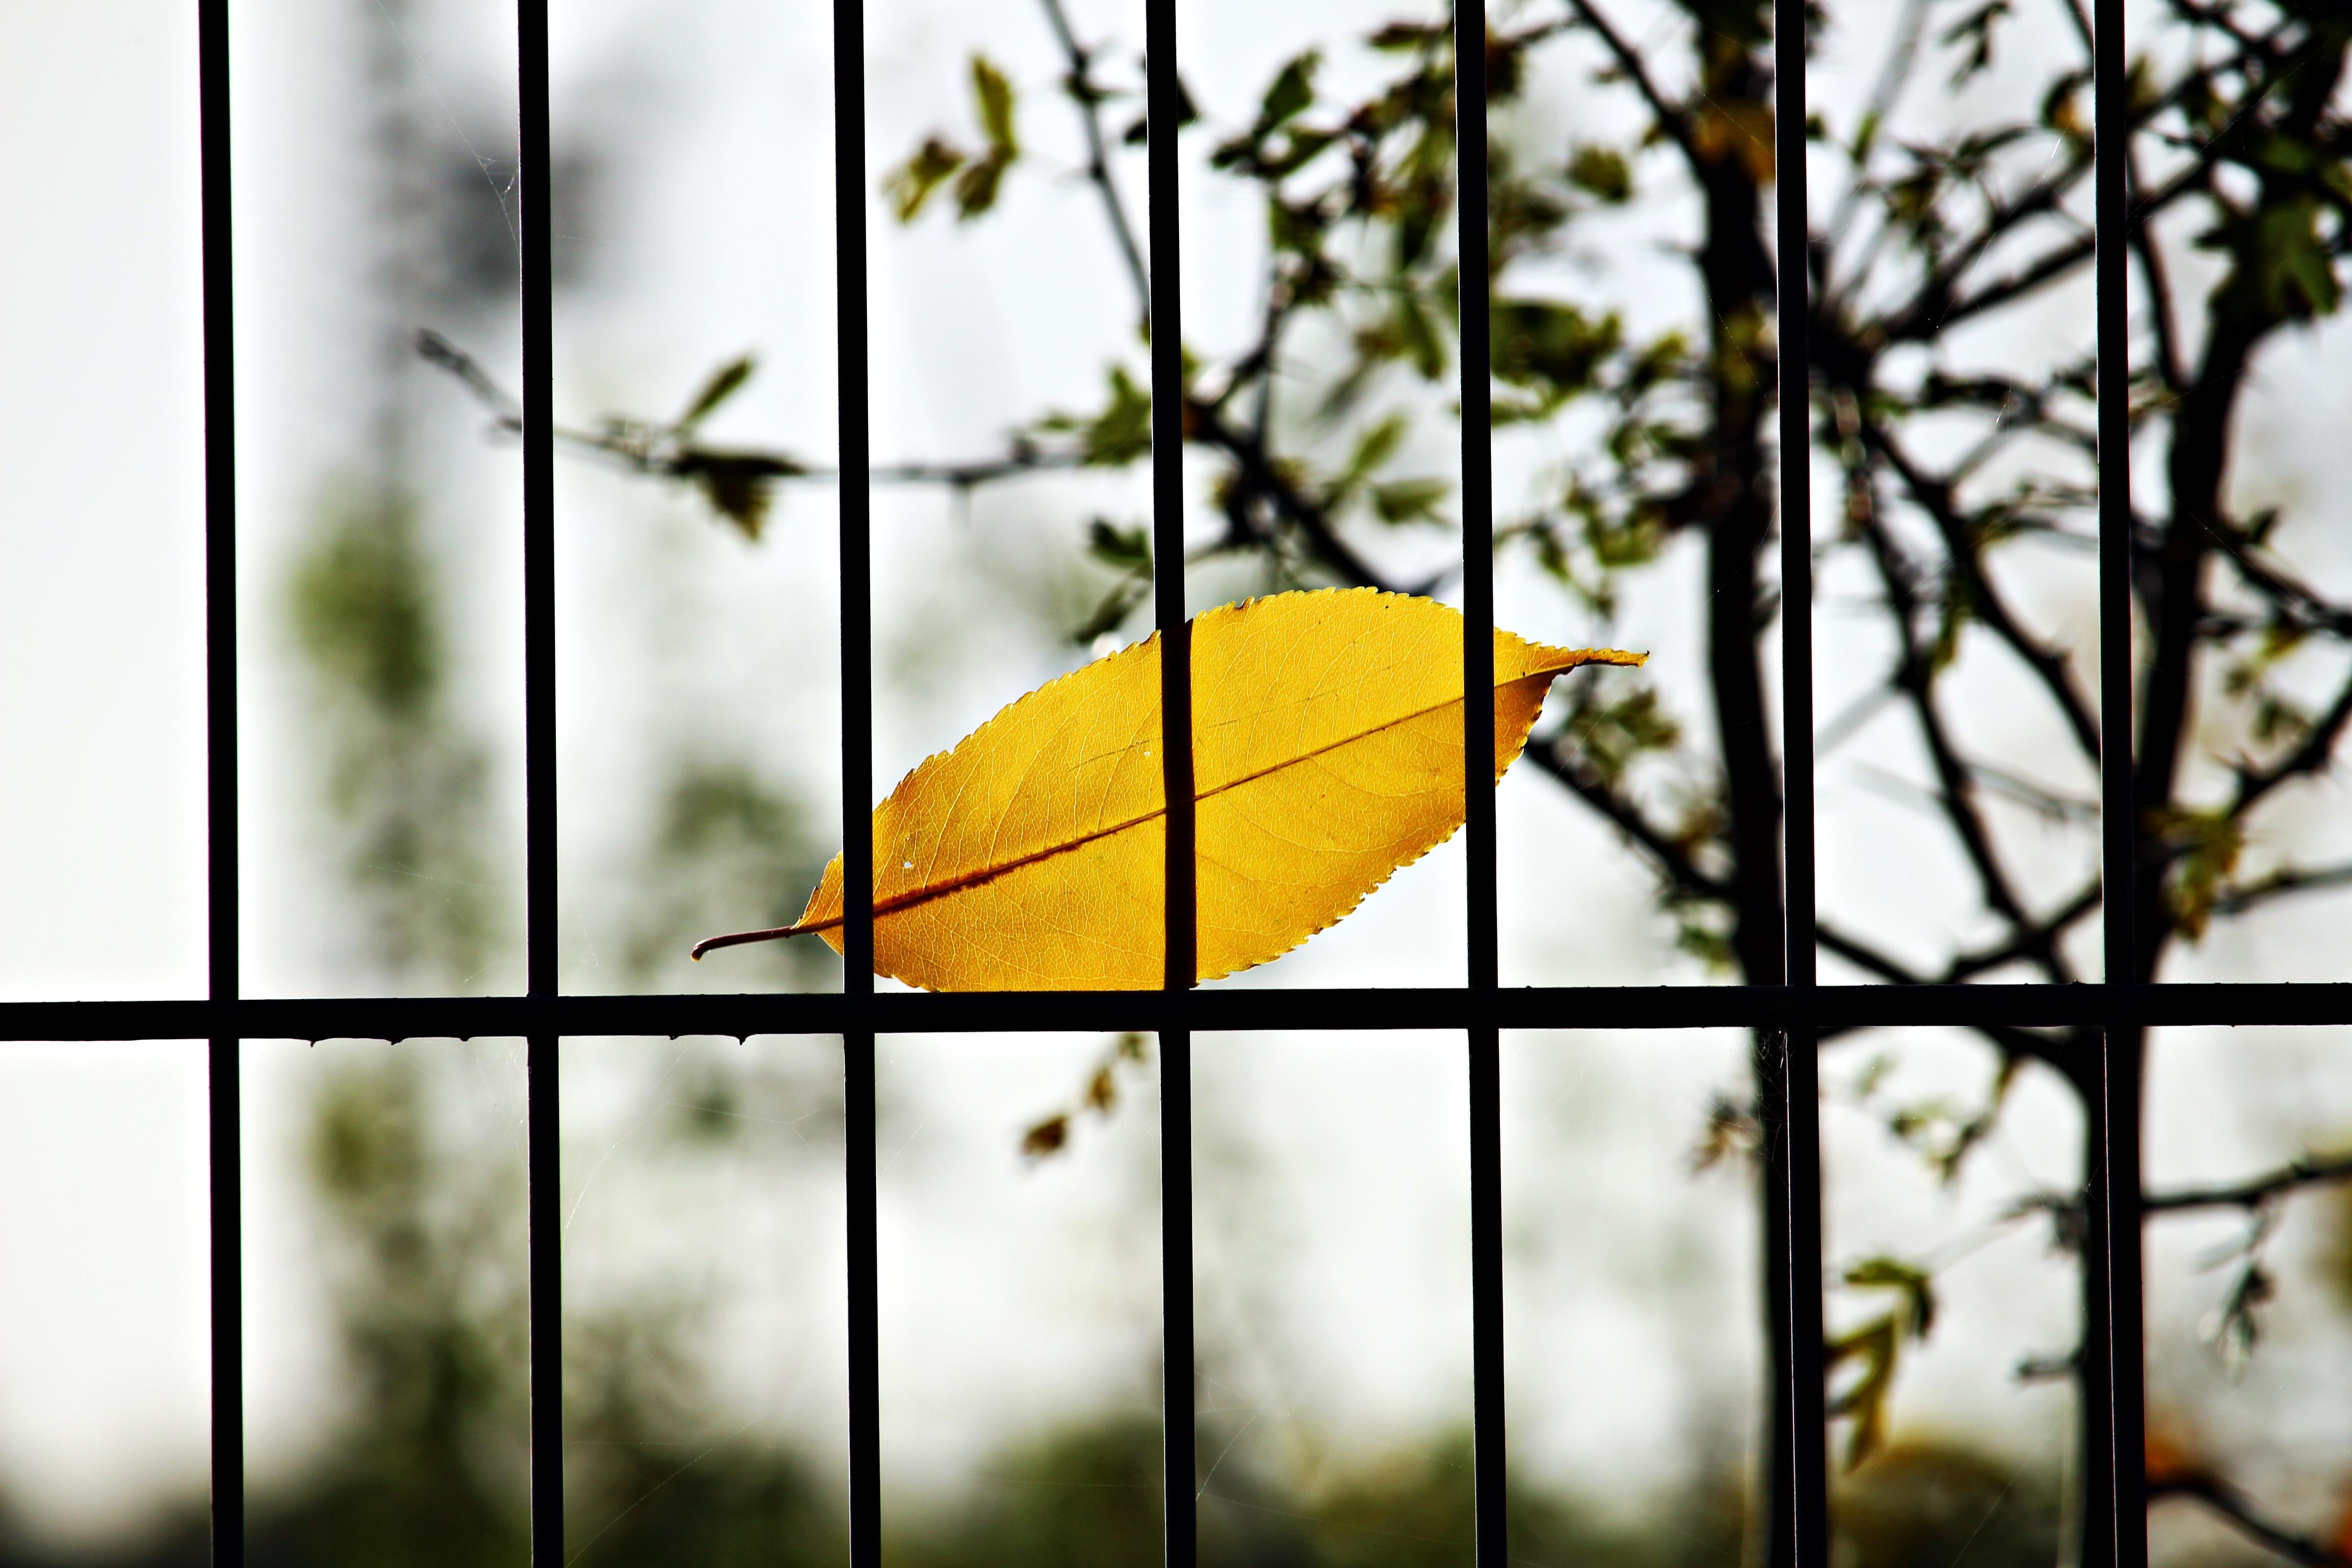 Branch Fence Sunlight Leaf Autumn Metal Yellow Gate Season Bars Grid Iron Fall Foliage Colorful